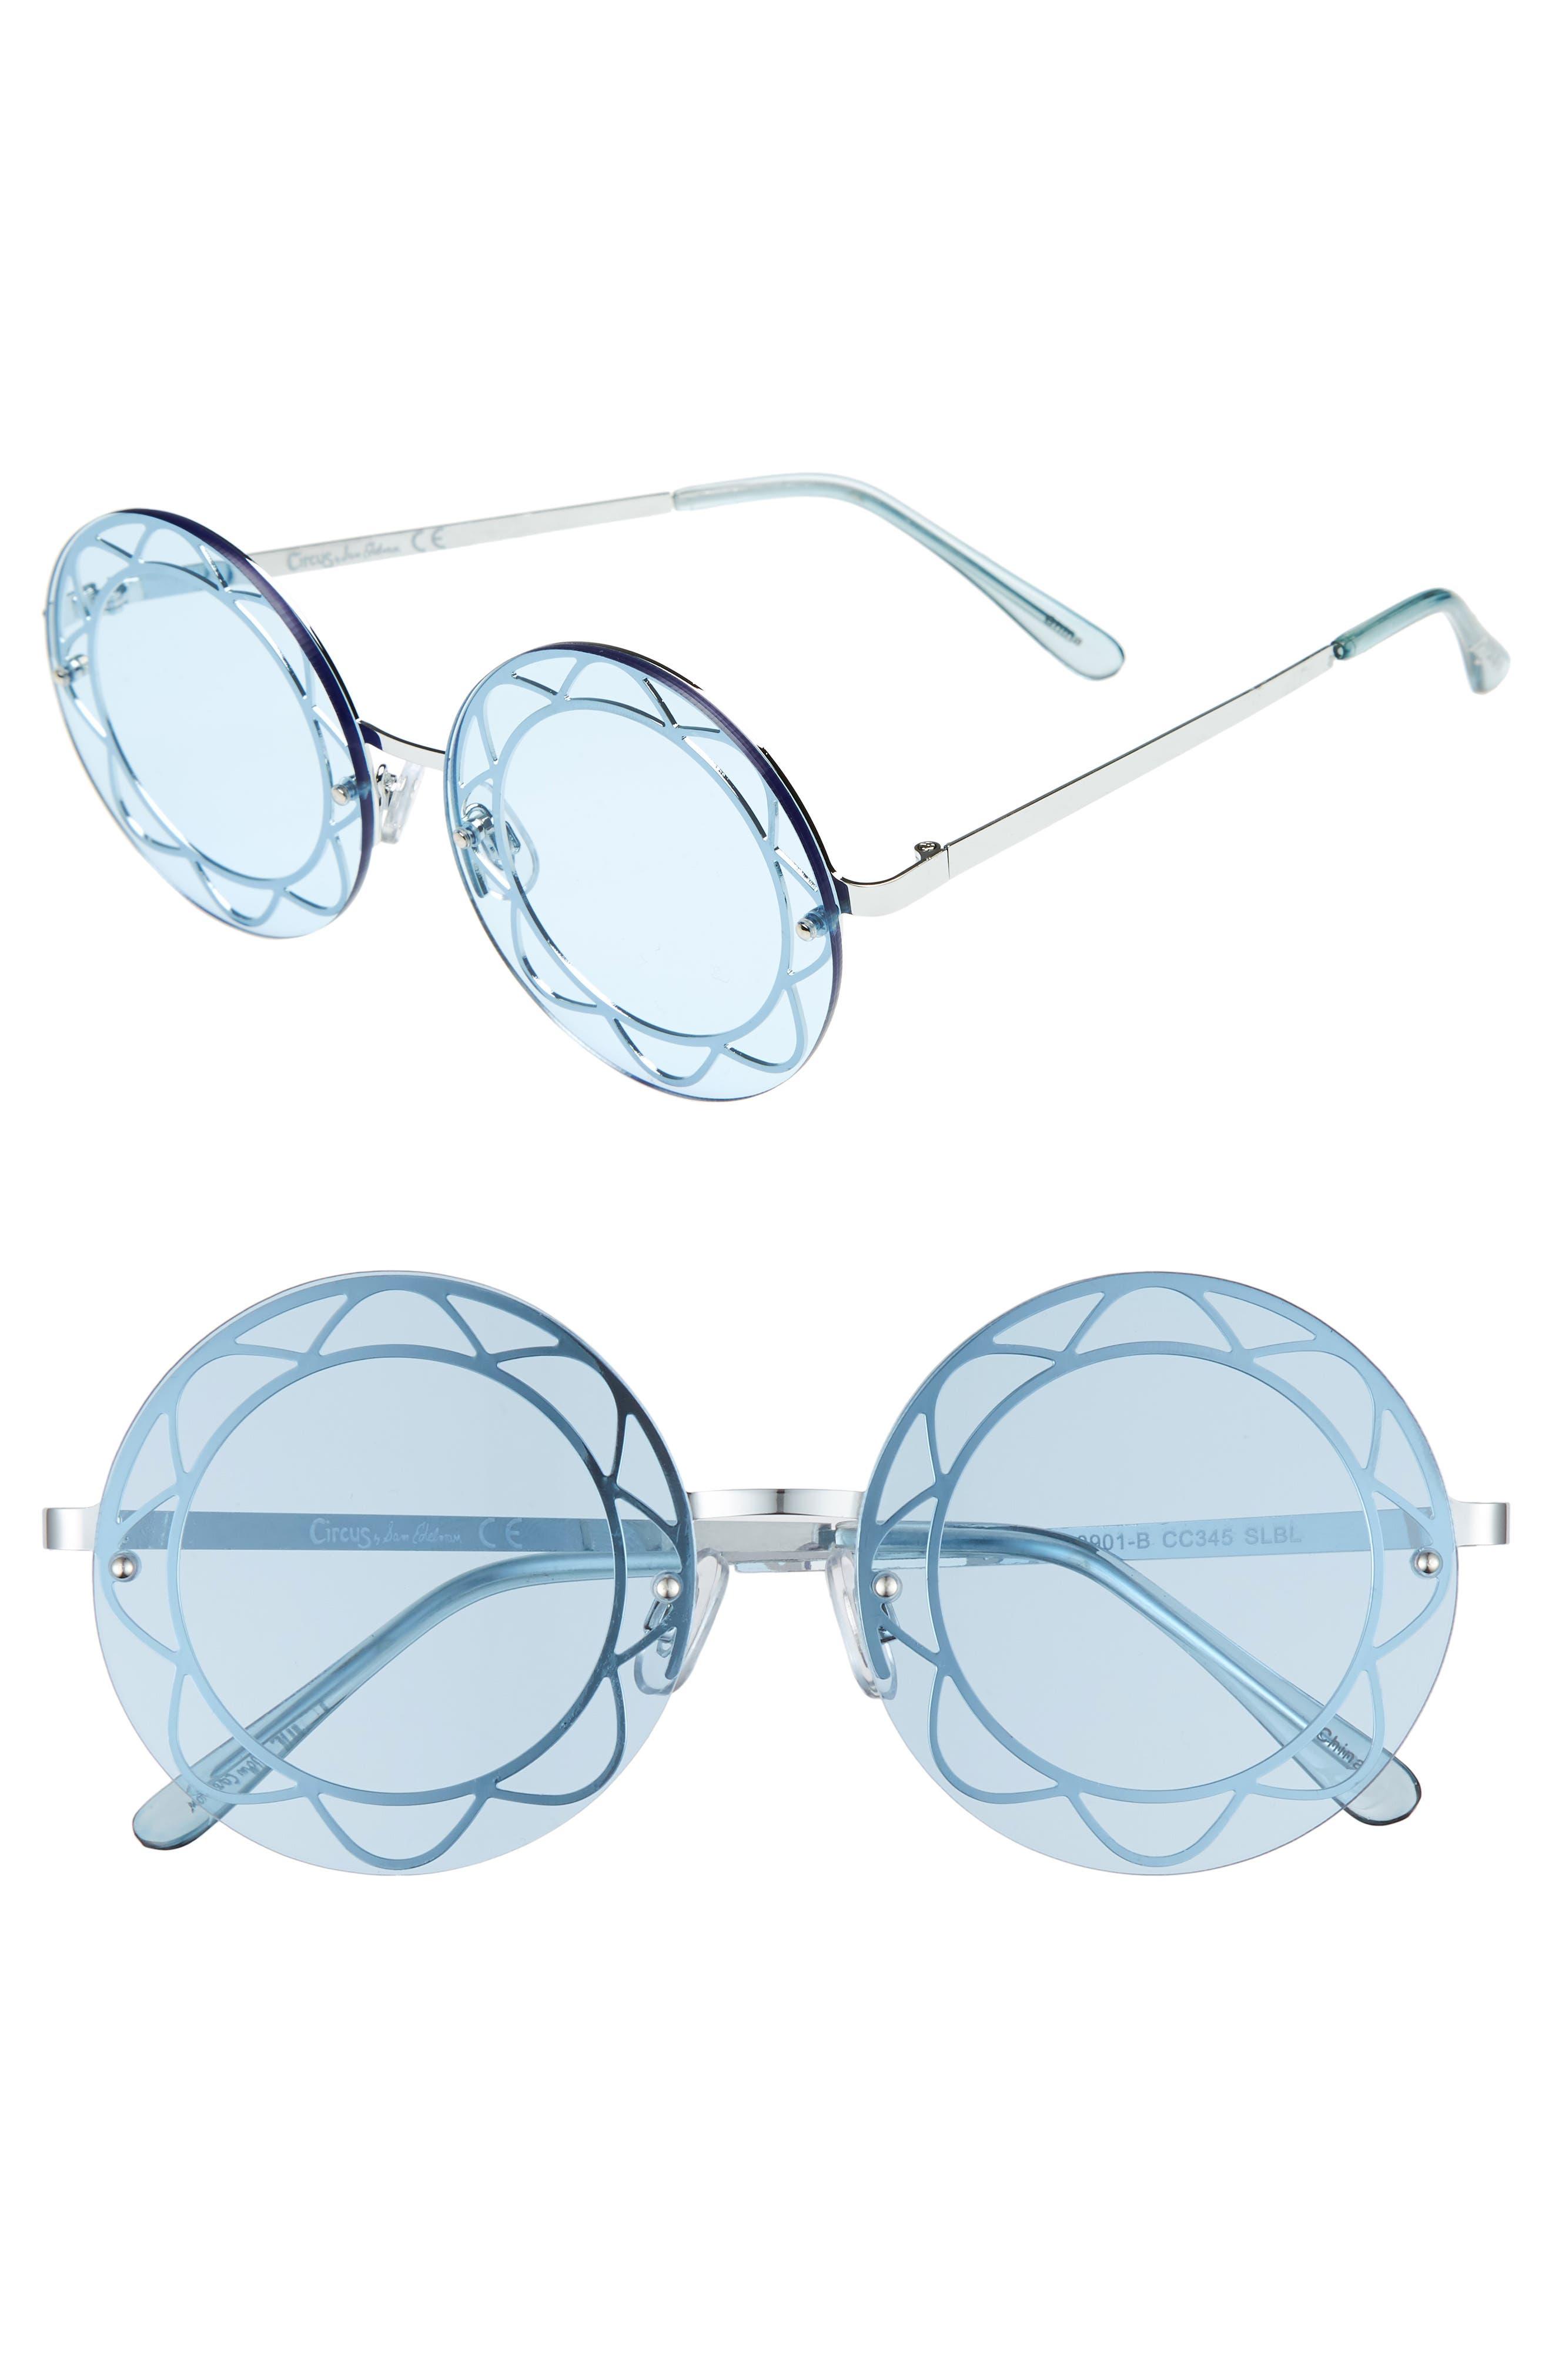 55mm Round Sunglasses,                         Main,                         color, 047